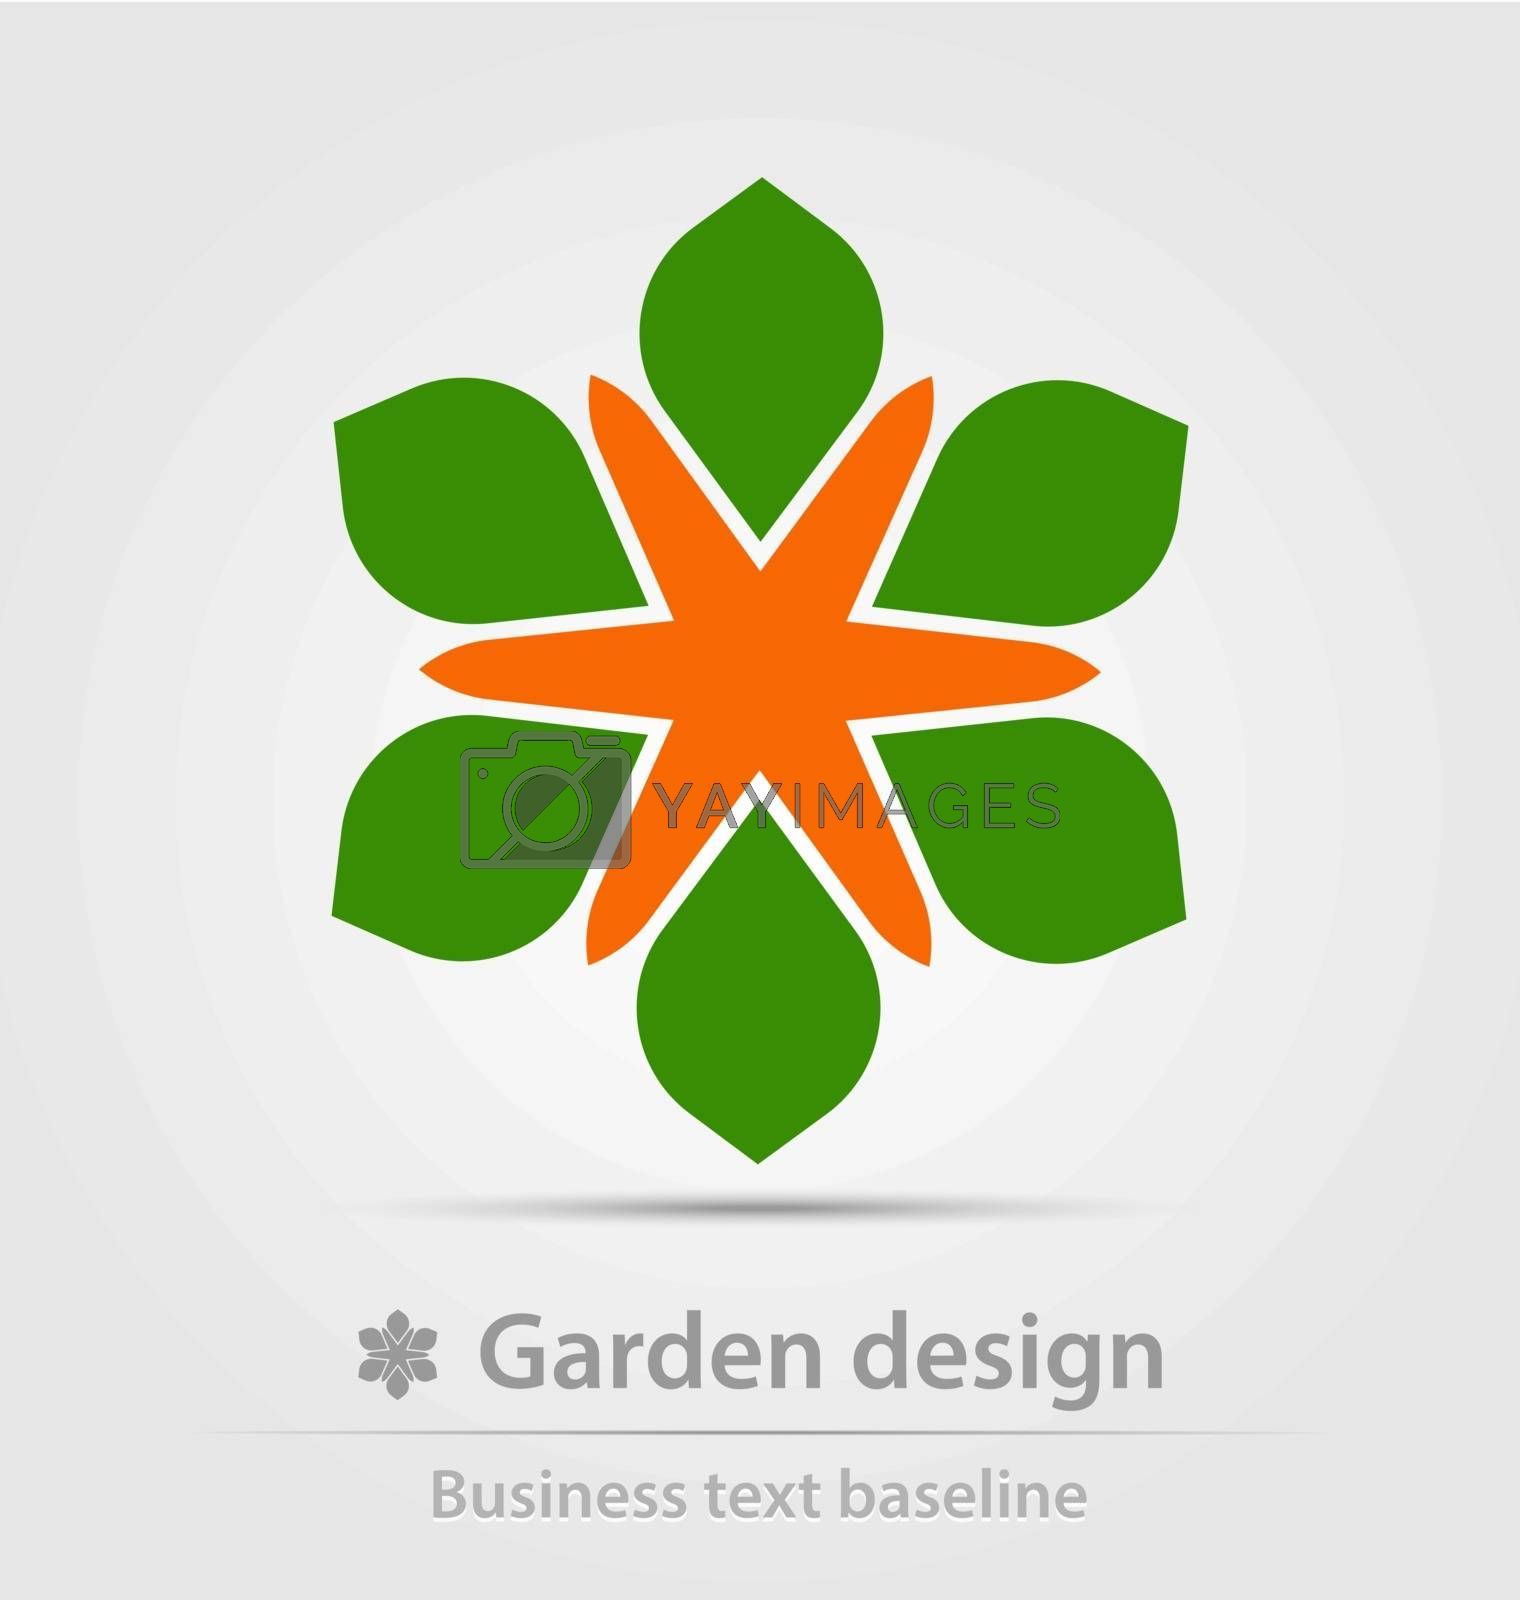 Garden design business icon for creative design work